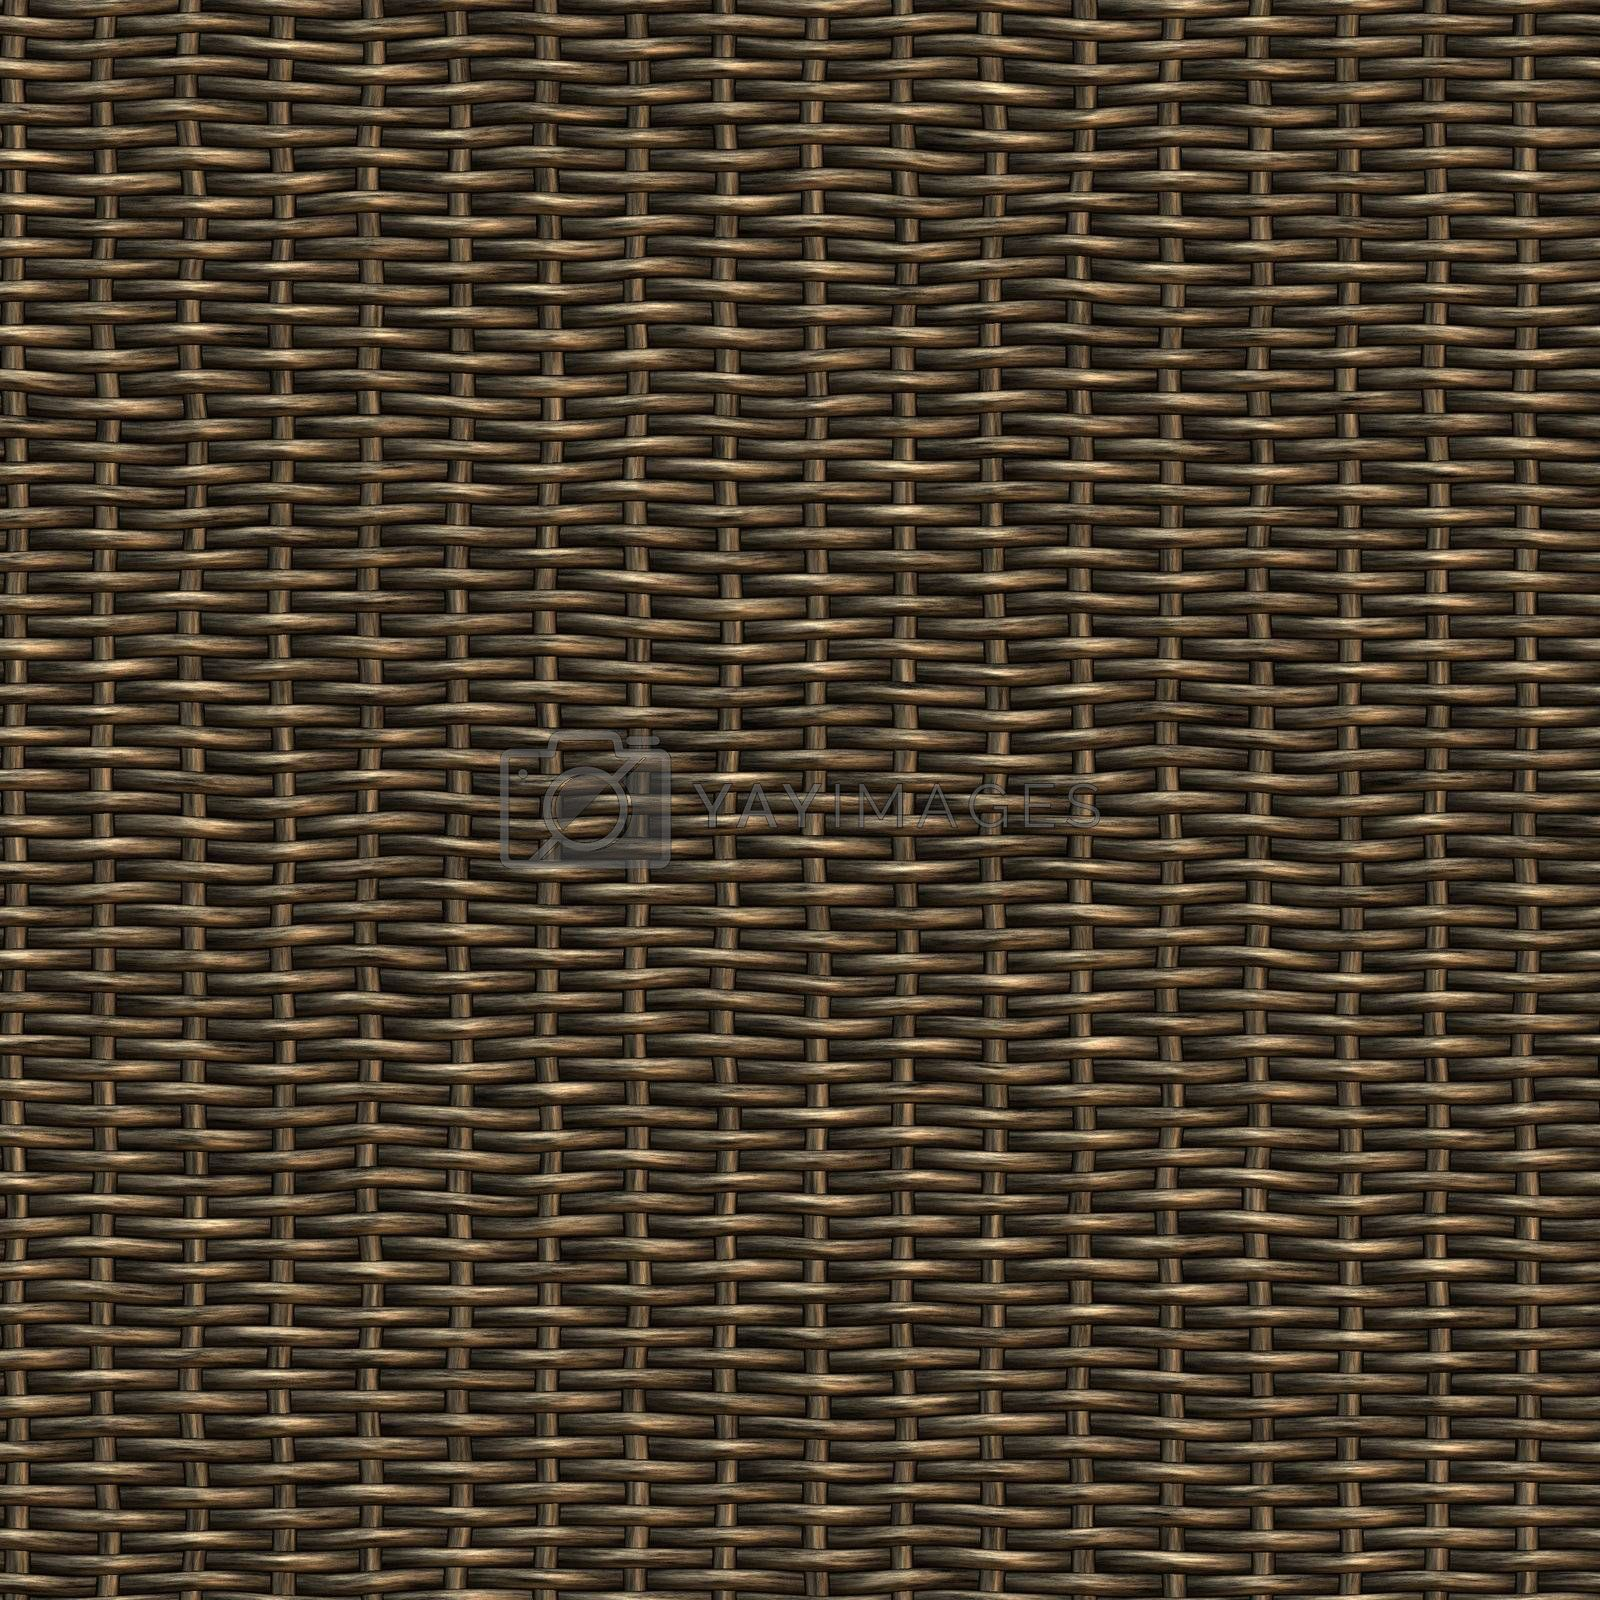 wicker basket weaving pattern, seamless texture for background